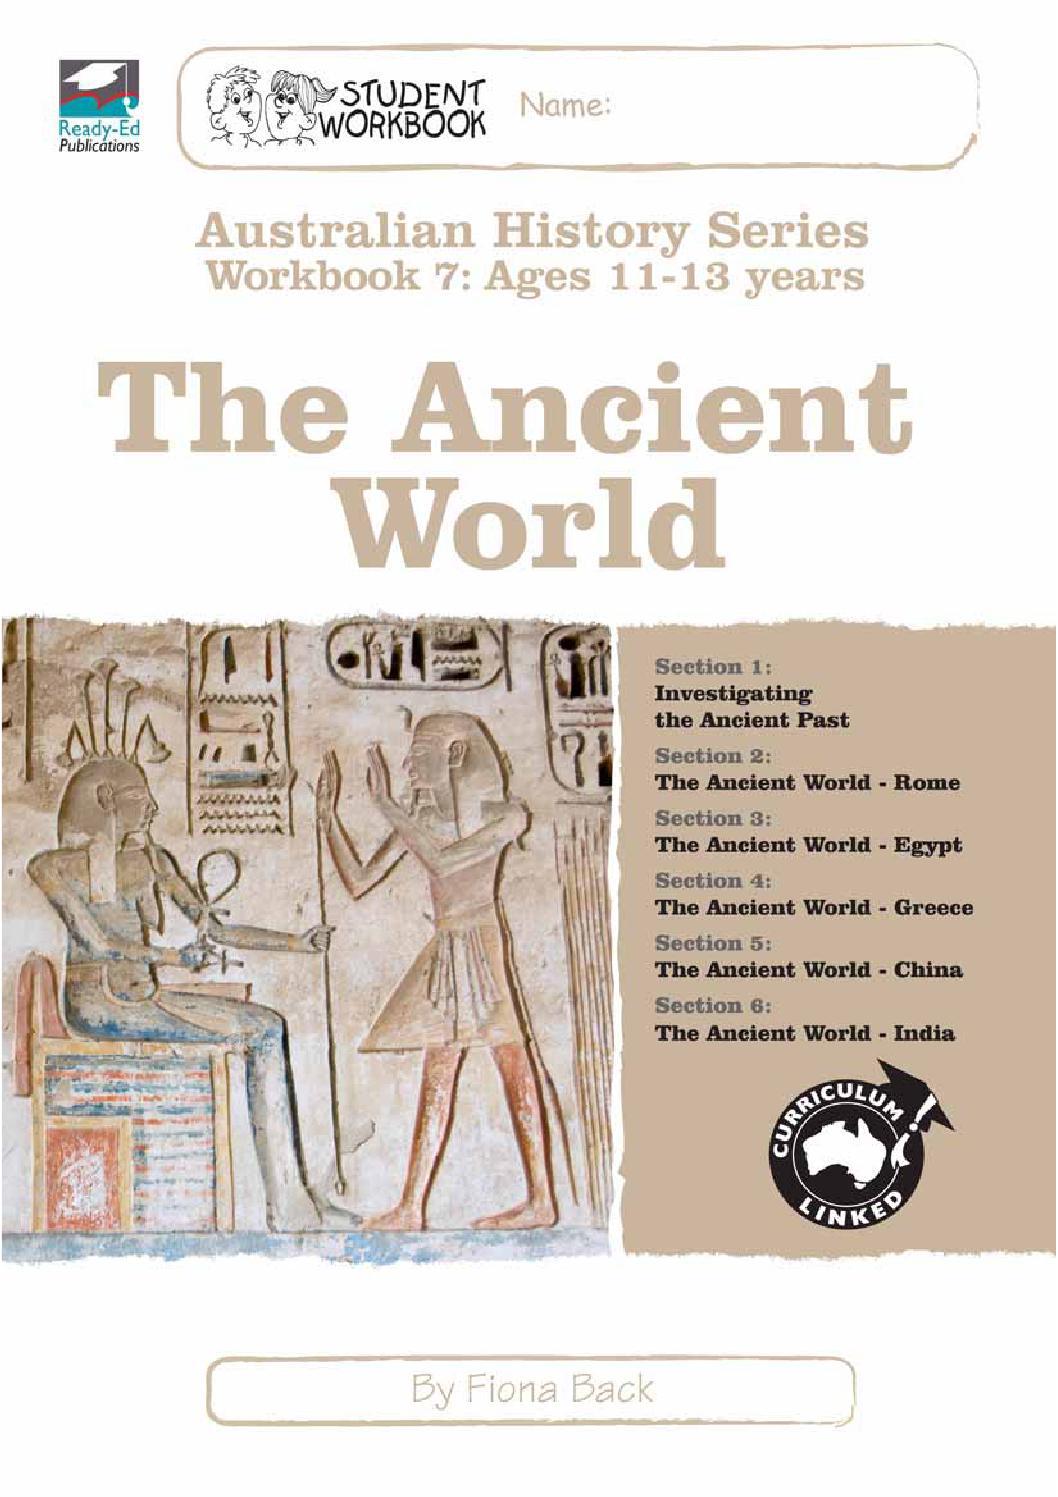 Workbooks bc science 10 workbook : Australian History Series Workbook 7: The Ancient World sample by ...